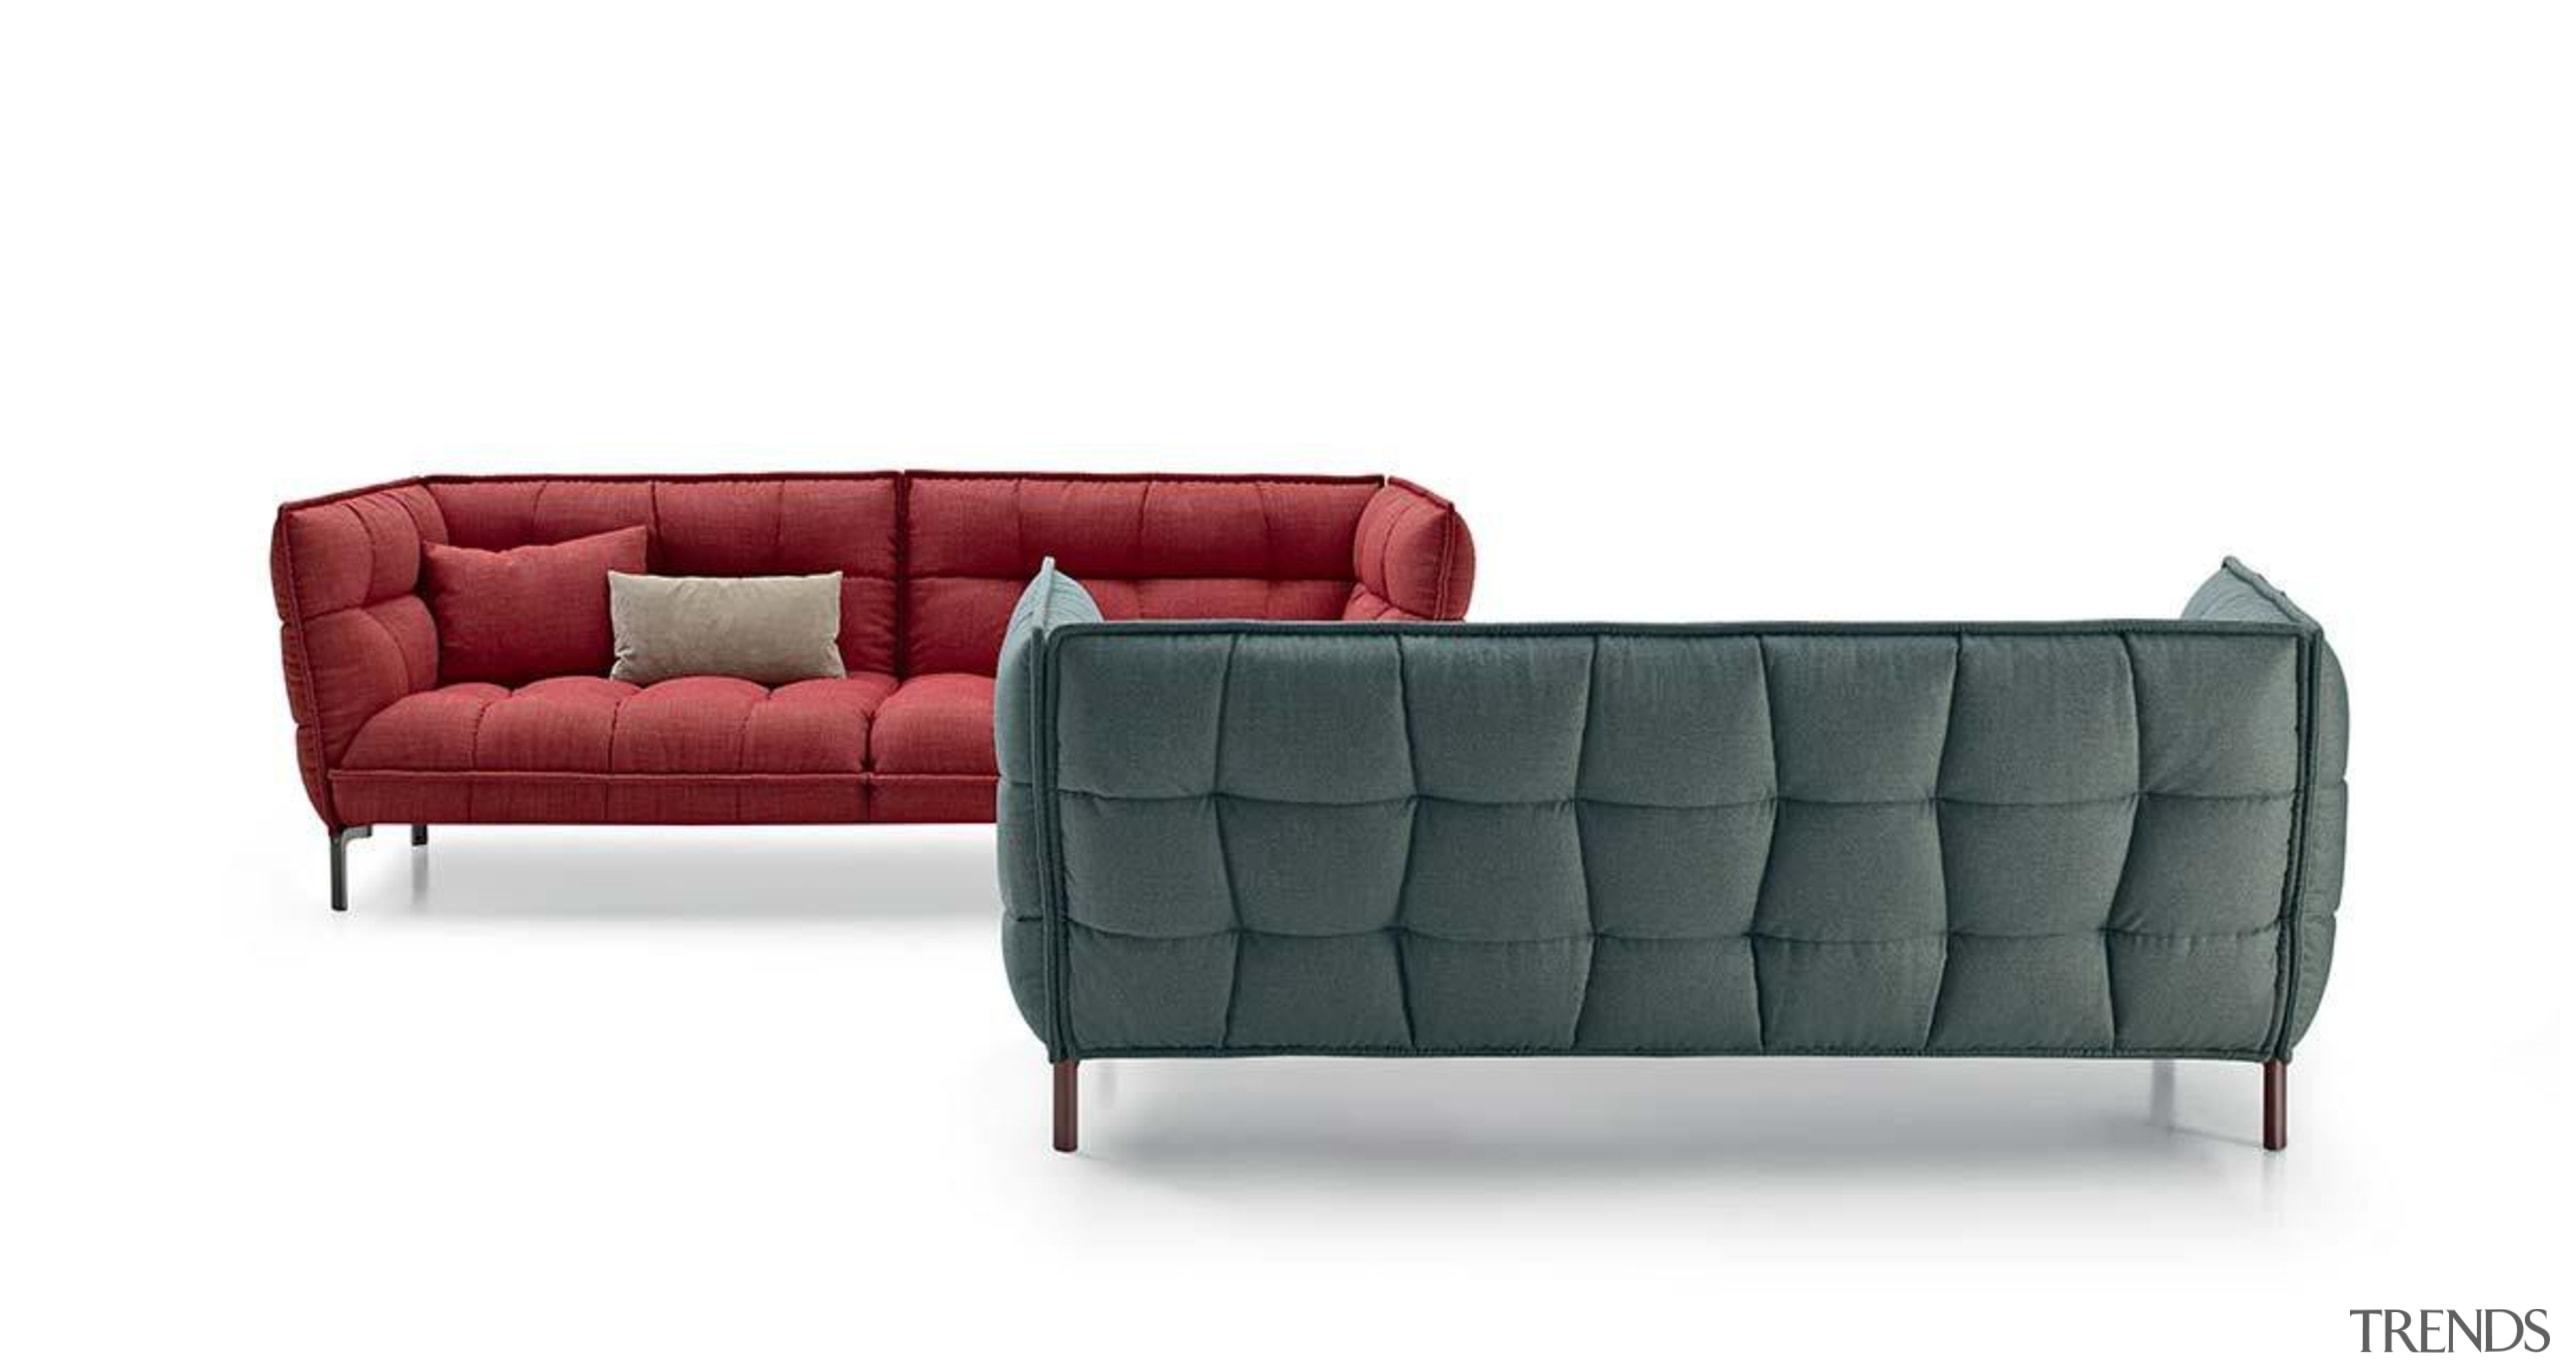 bebitaliaurquiolahusksofamix21200.jpg - bebitaliaurquiolahusksofamix21200.jpg - angle | couch | angle, couch, furniture, loveseat, product, product design, sofa bed, white